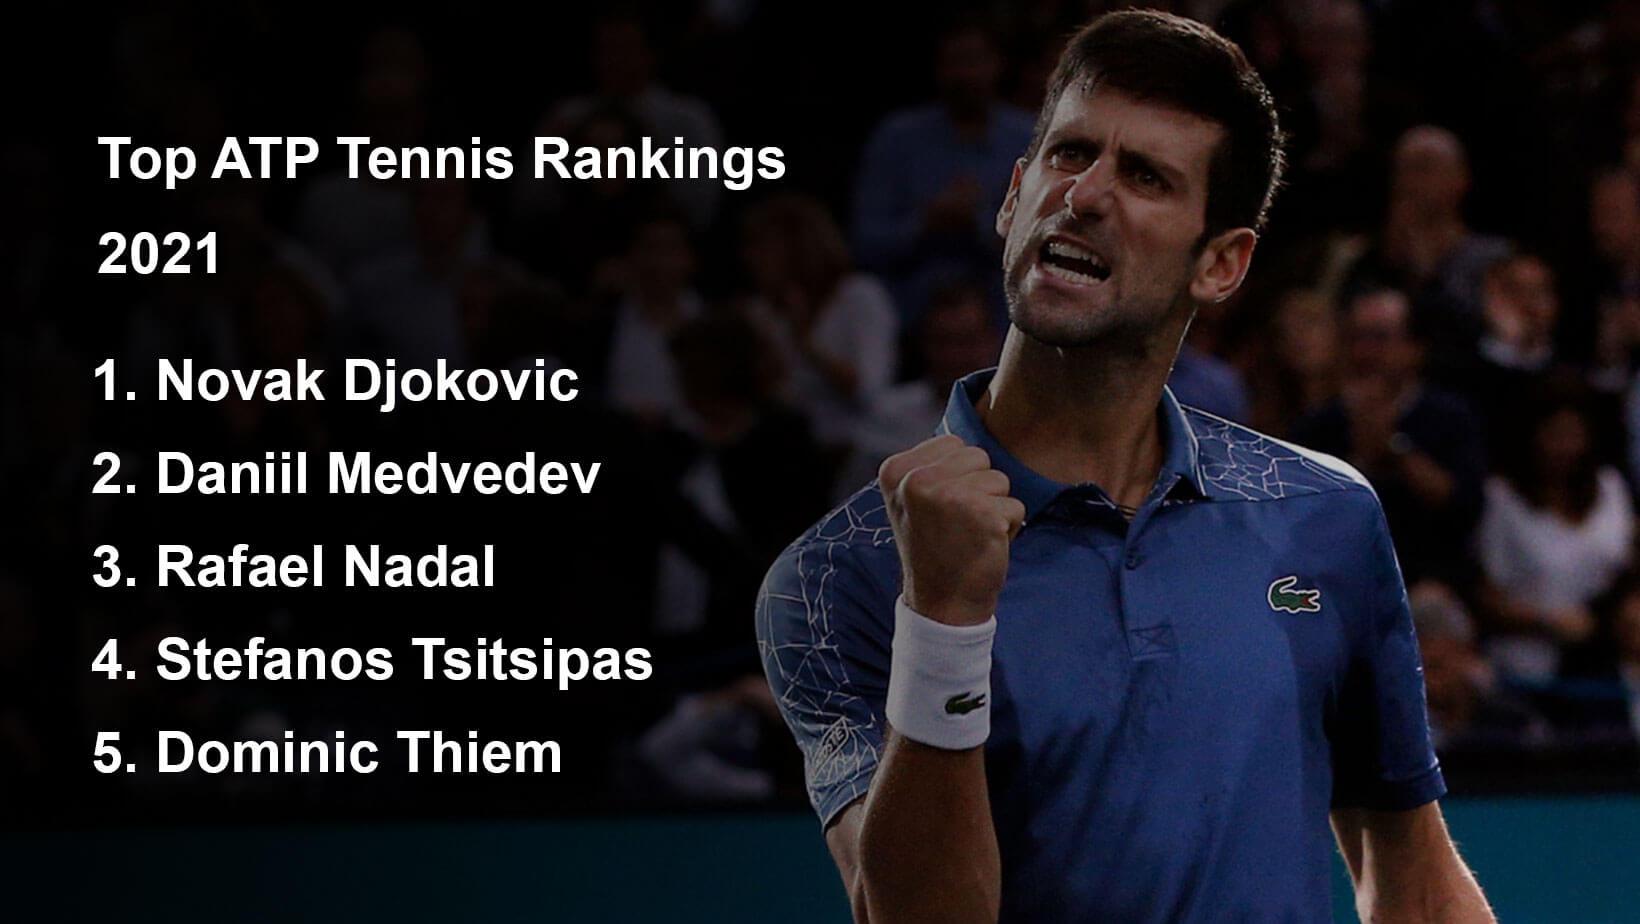 How Do Tennis Rankings Work?